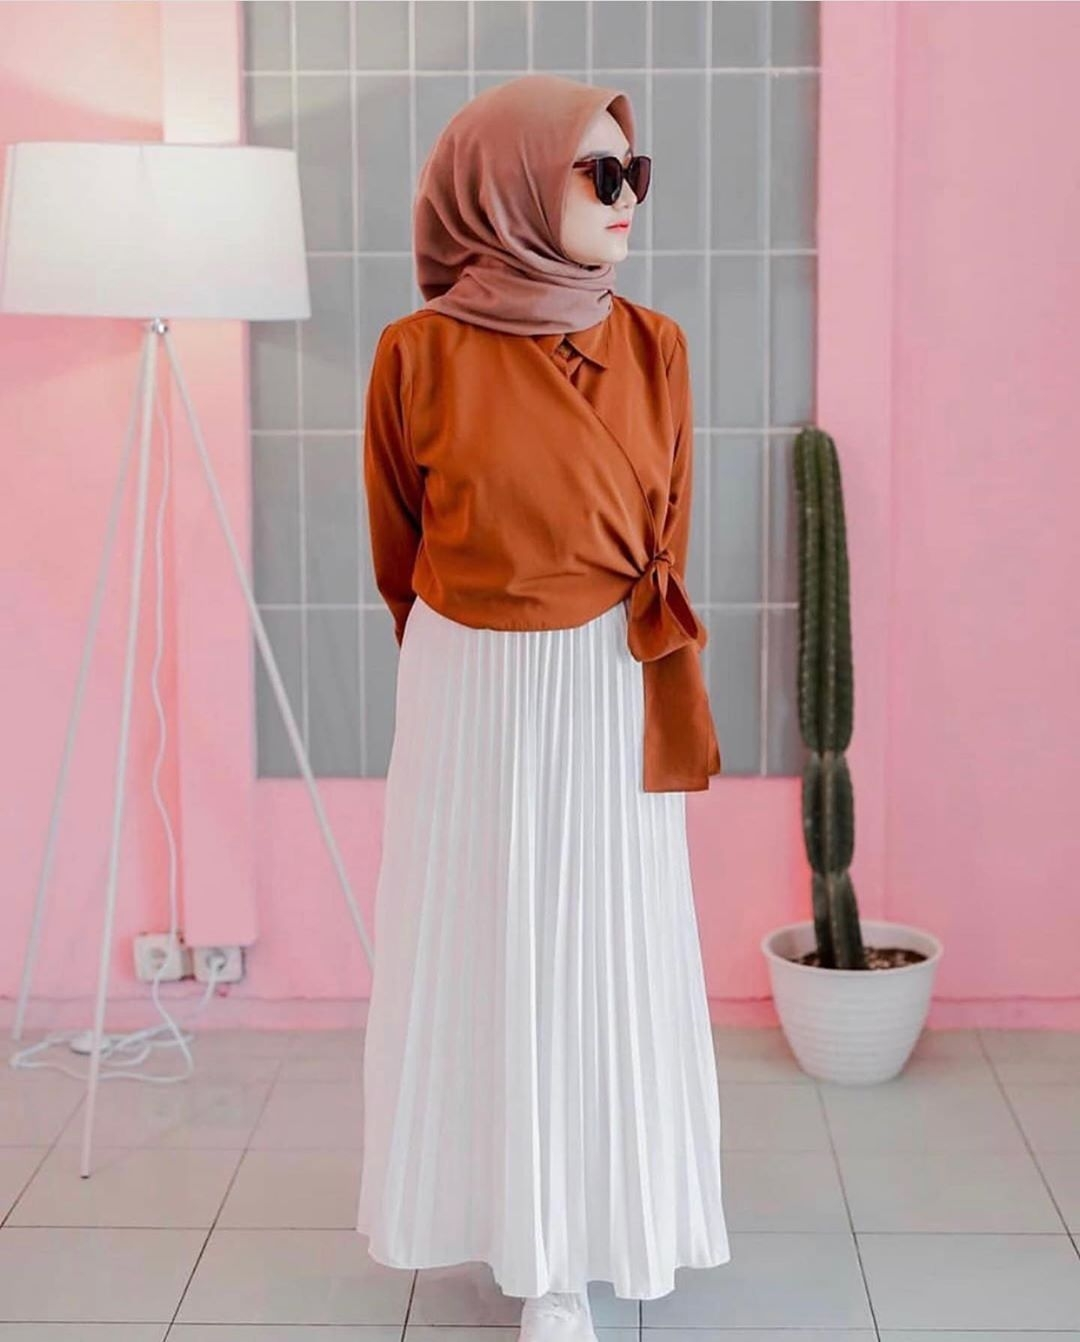 warna baru masya allah warna white rok plisket akhirnya